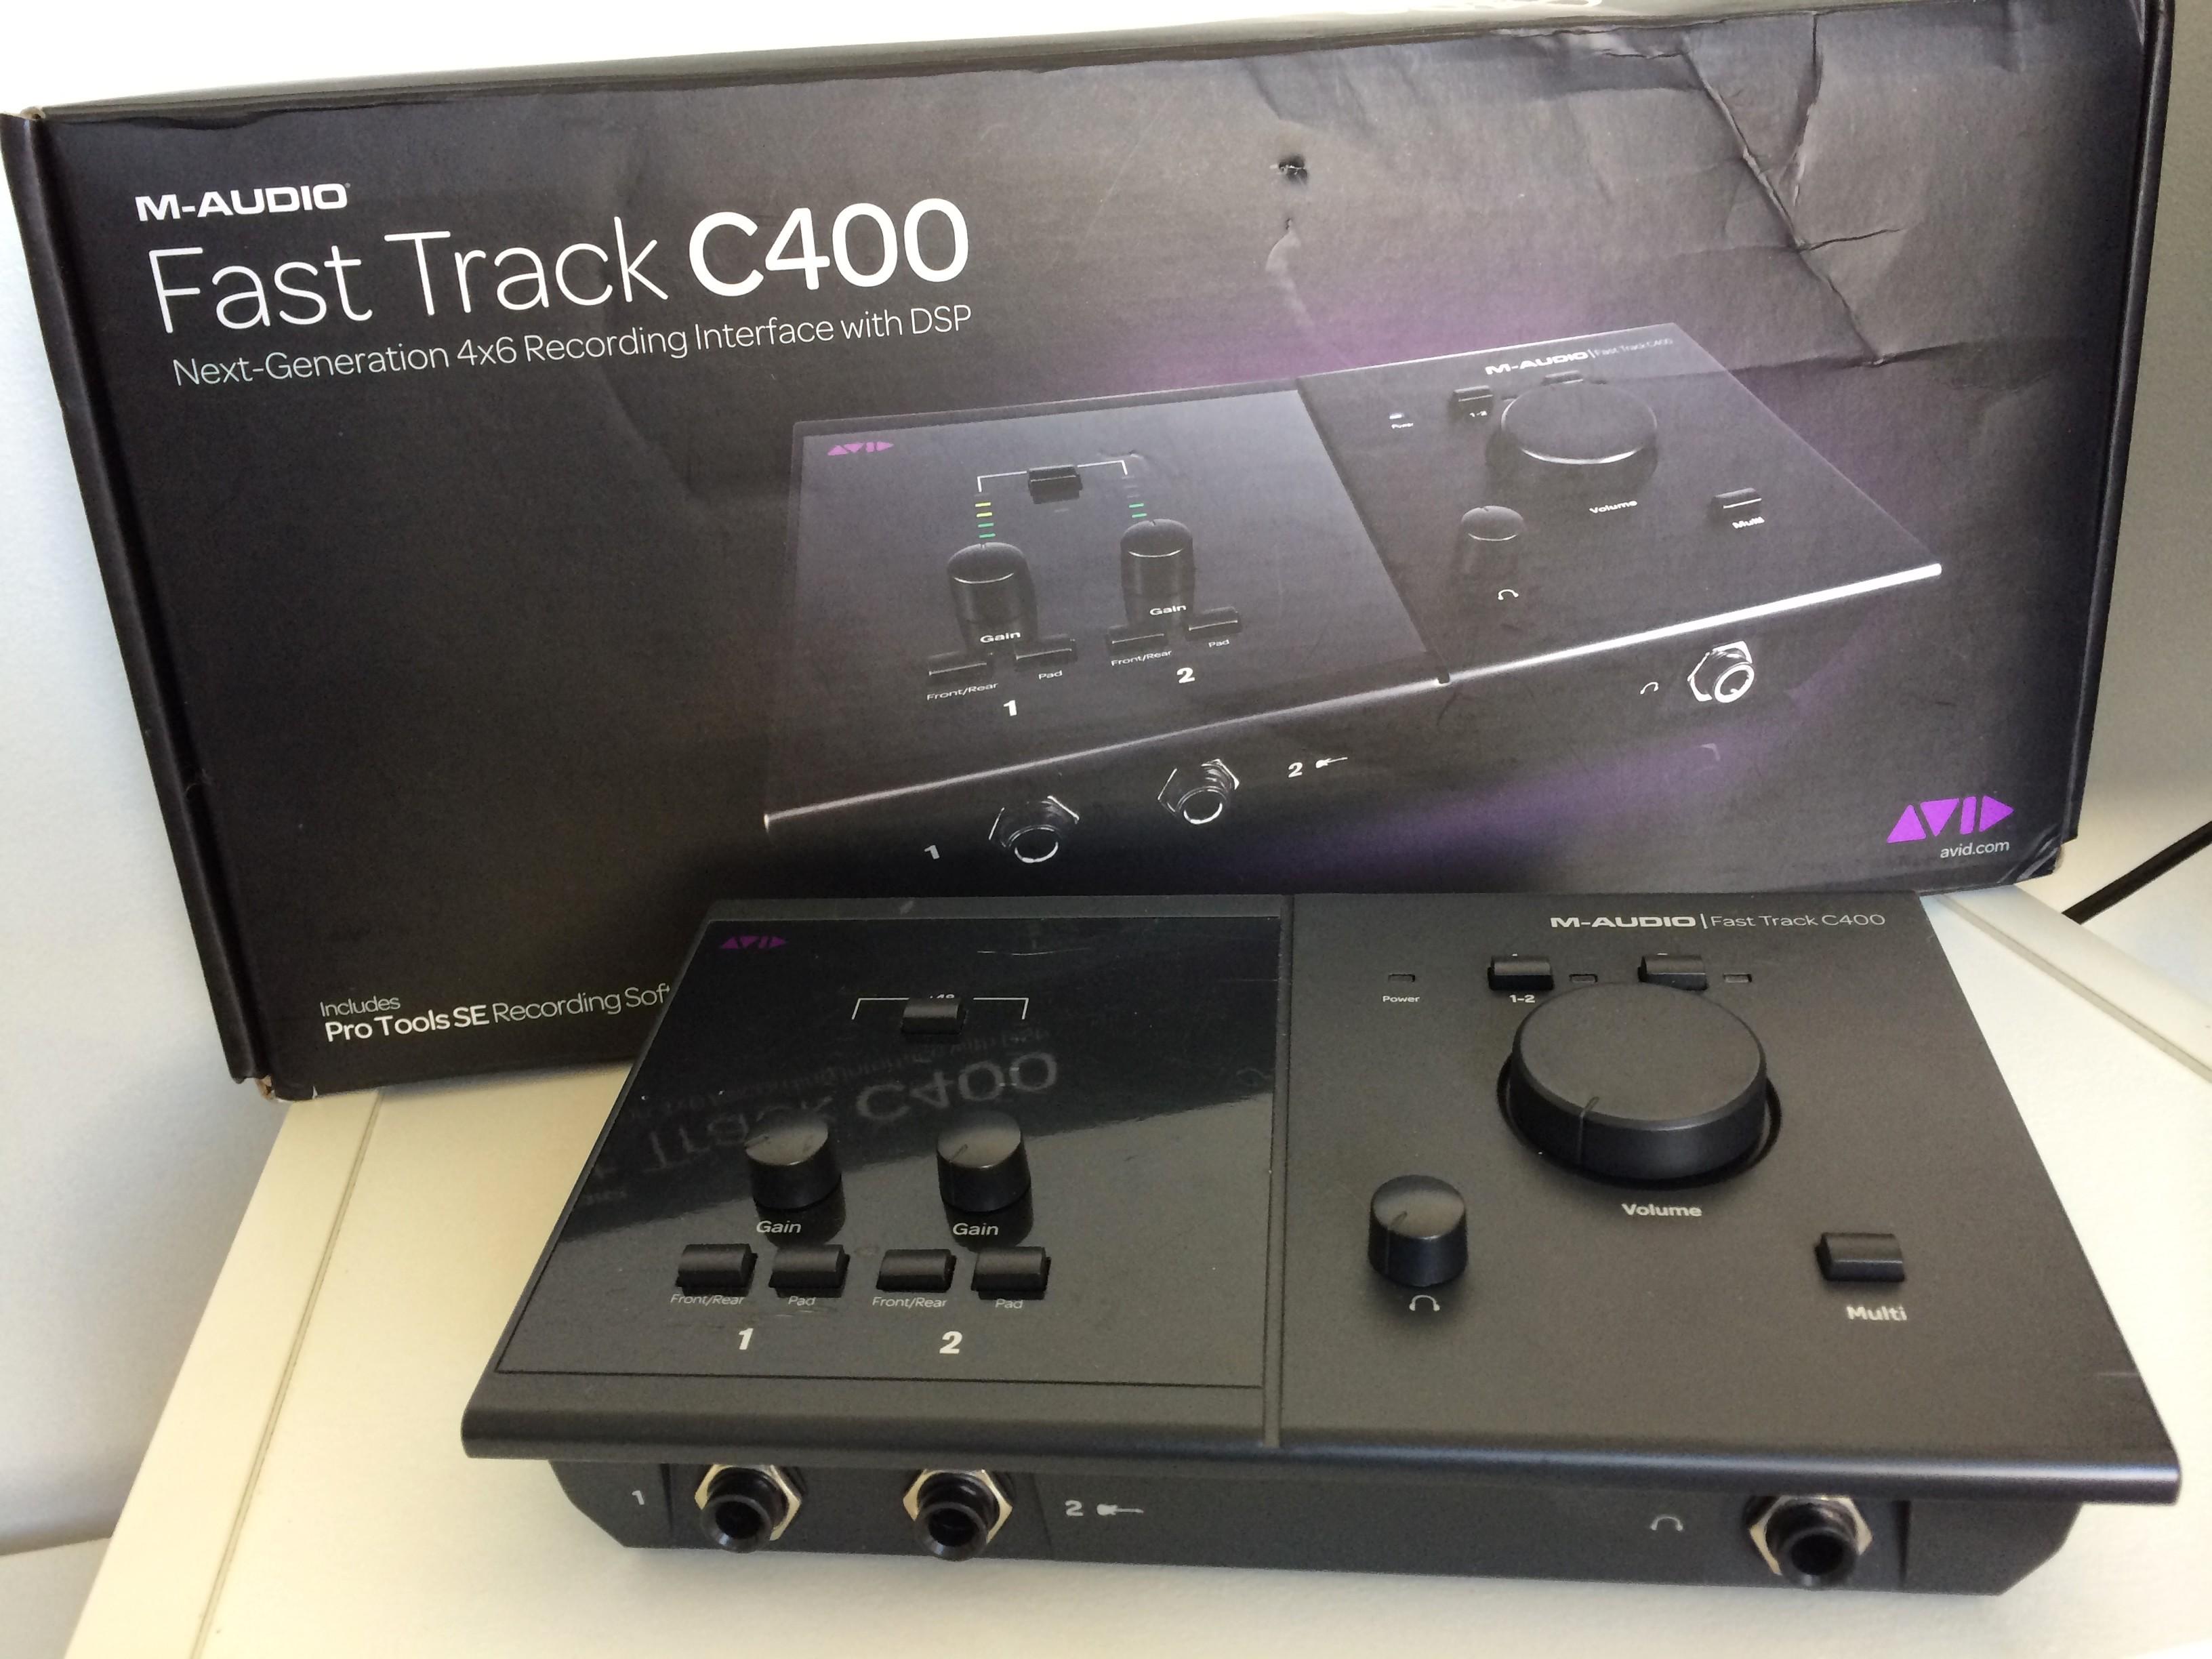 m-audio fast track c400 drivers windows 7